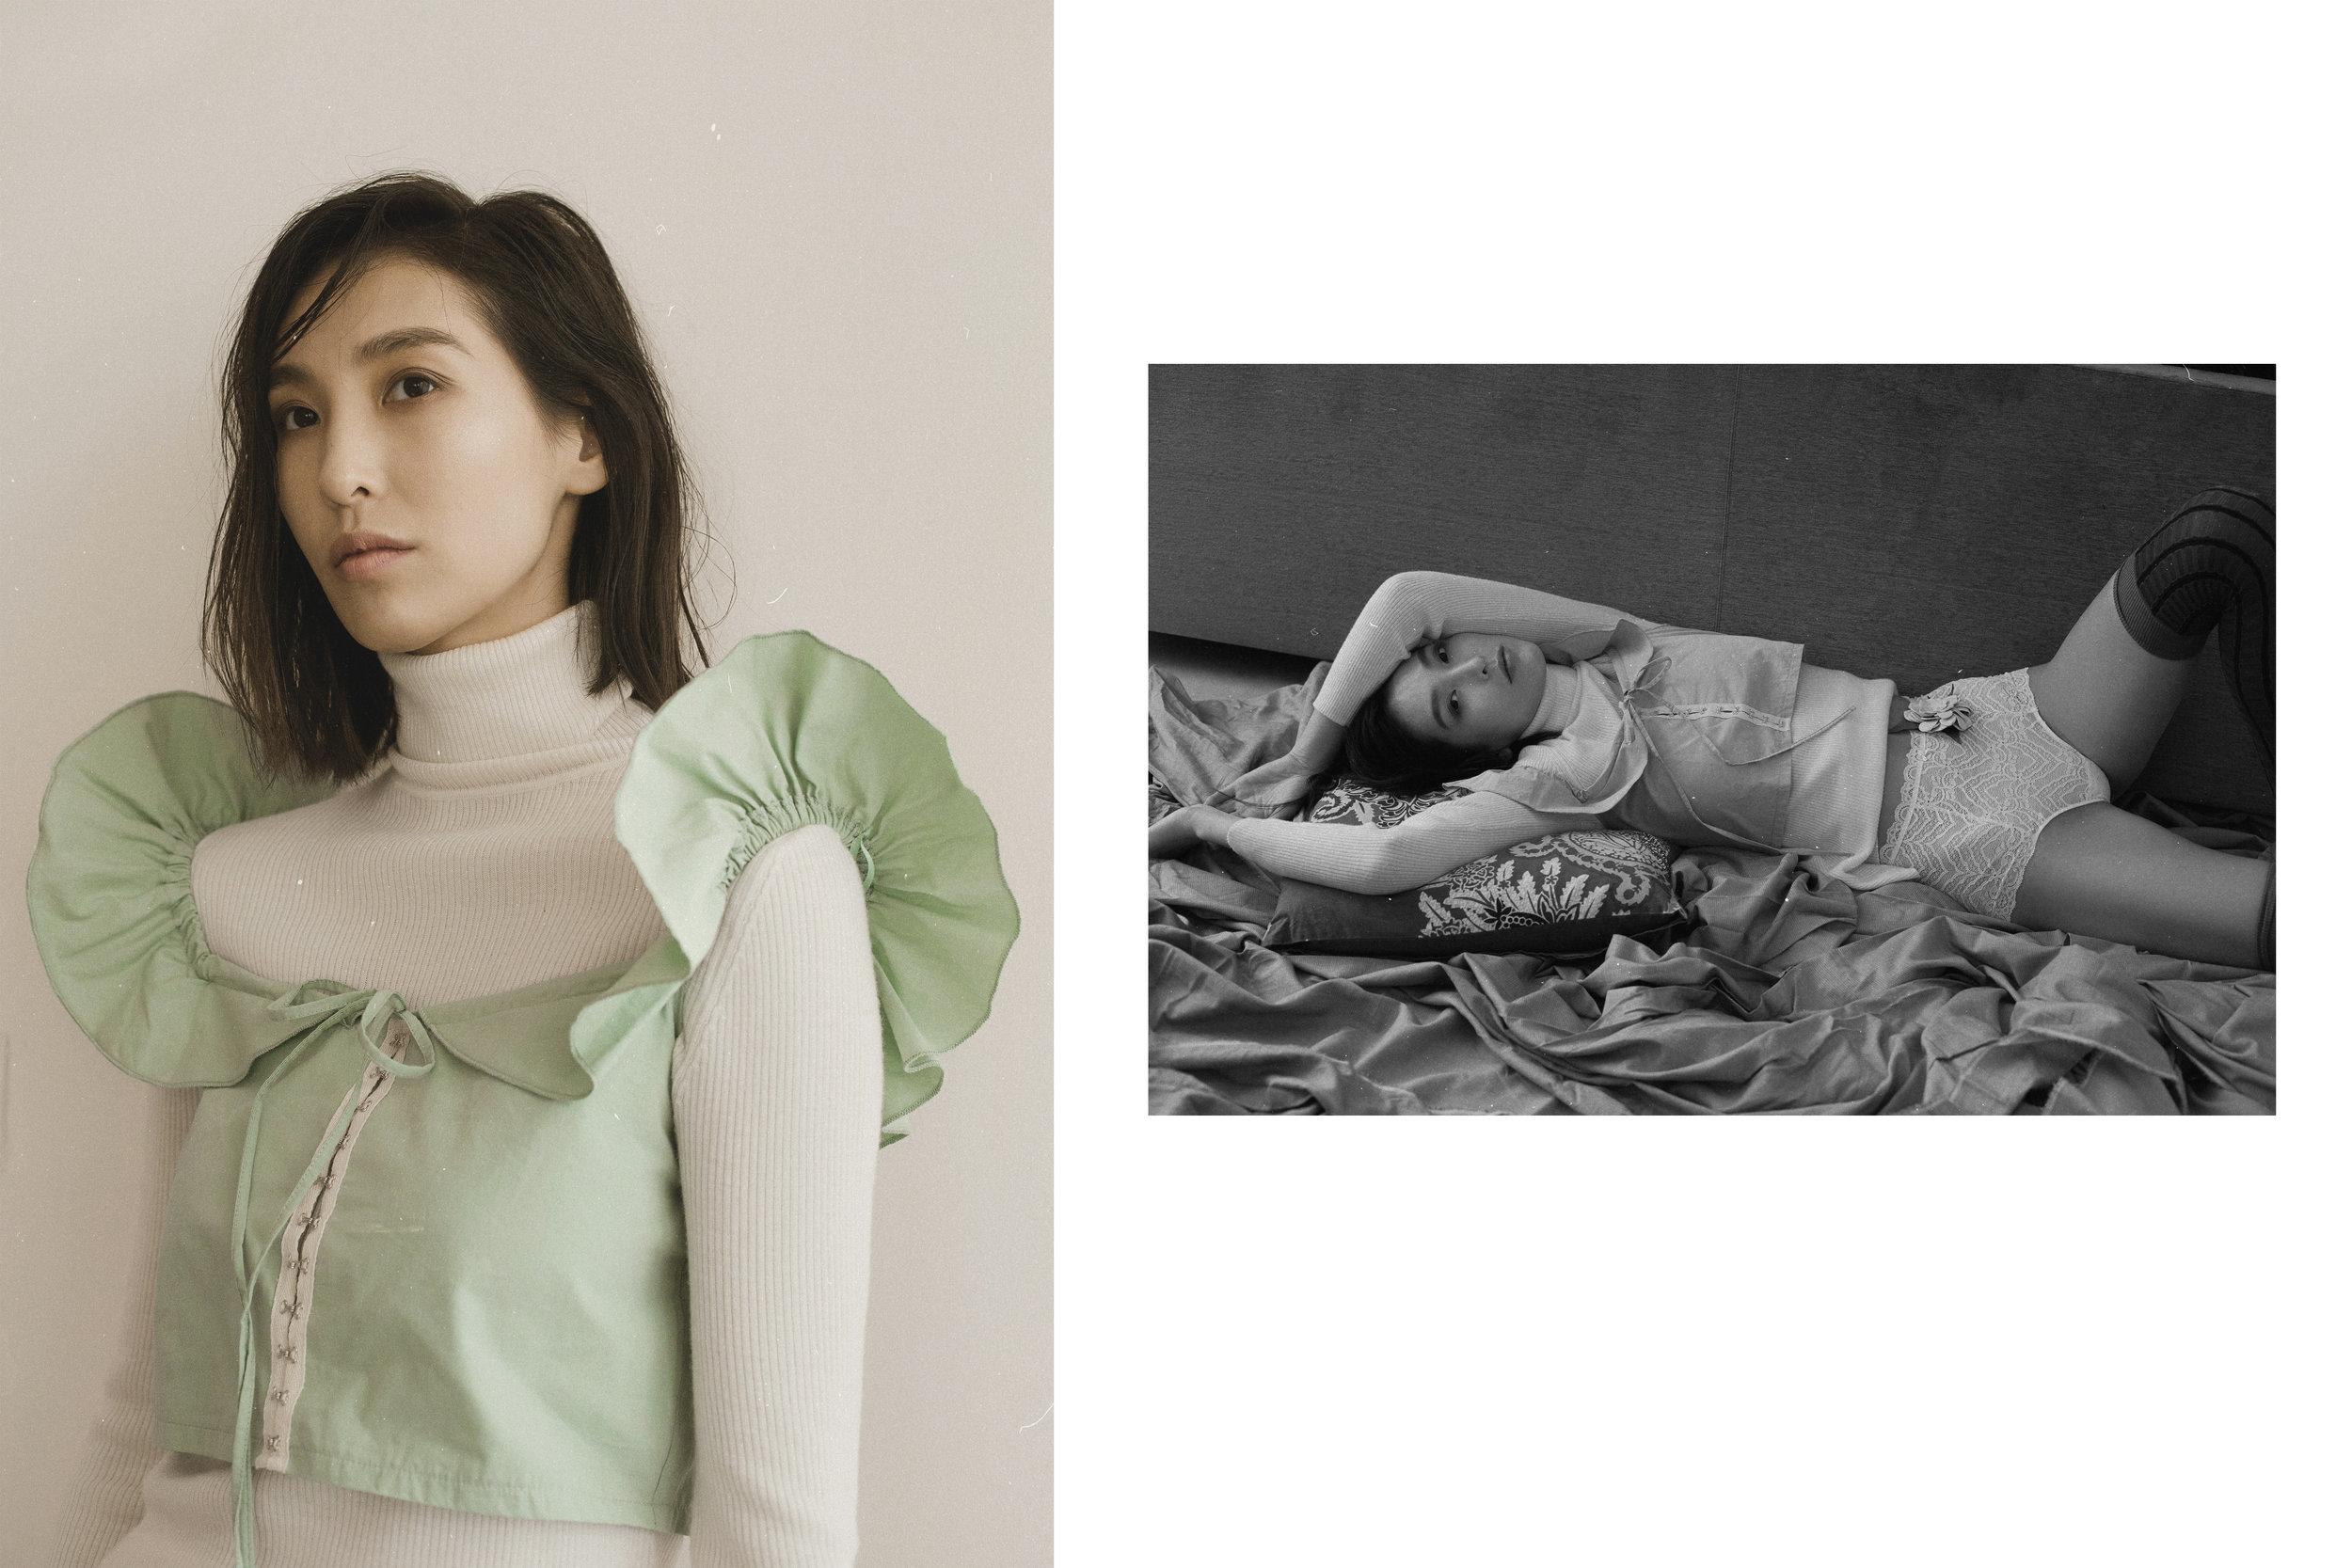 Turtleneck Wolford, The top Zara, Brooch-flower property stylist, Prada stockings, Cowards Intimissimi